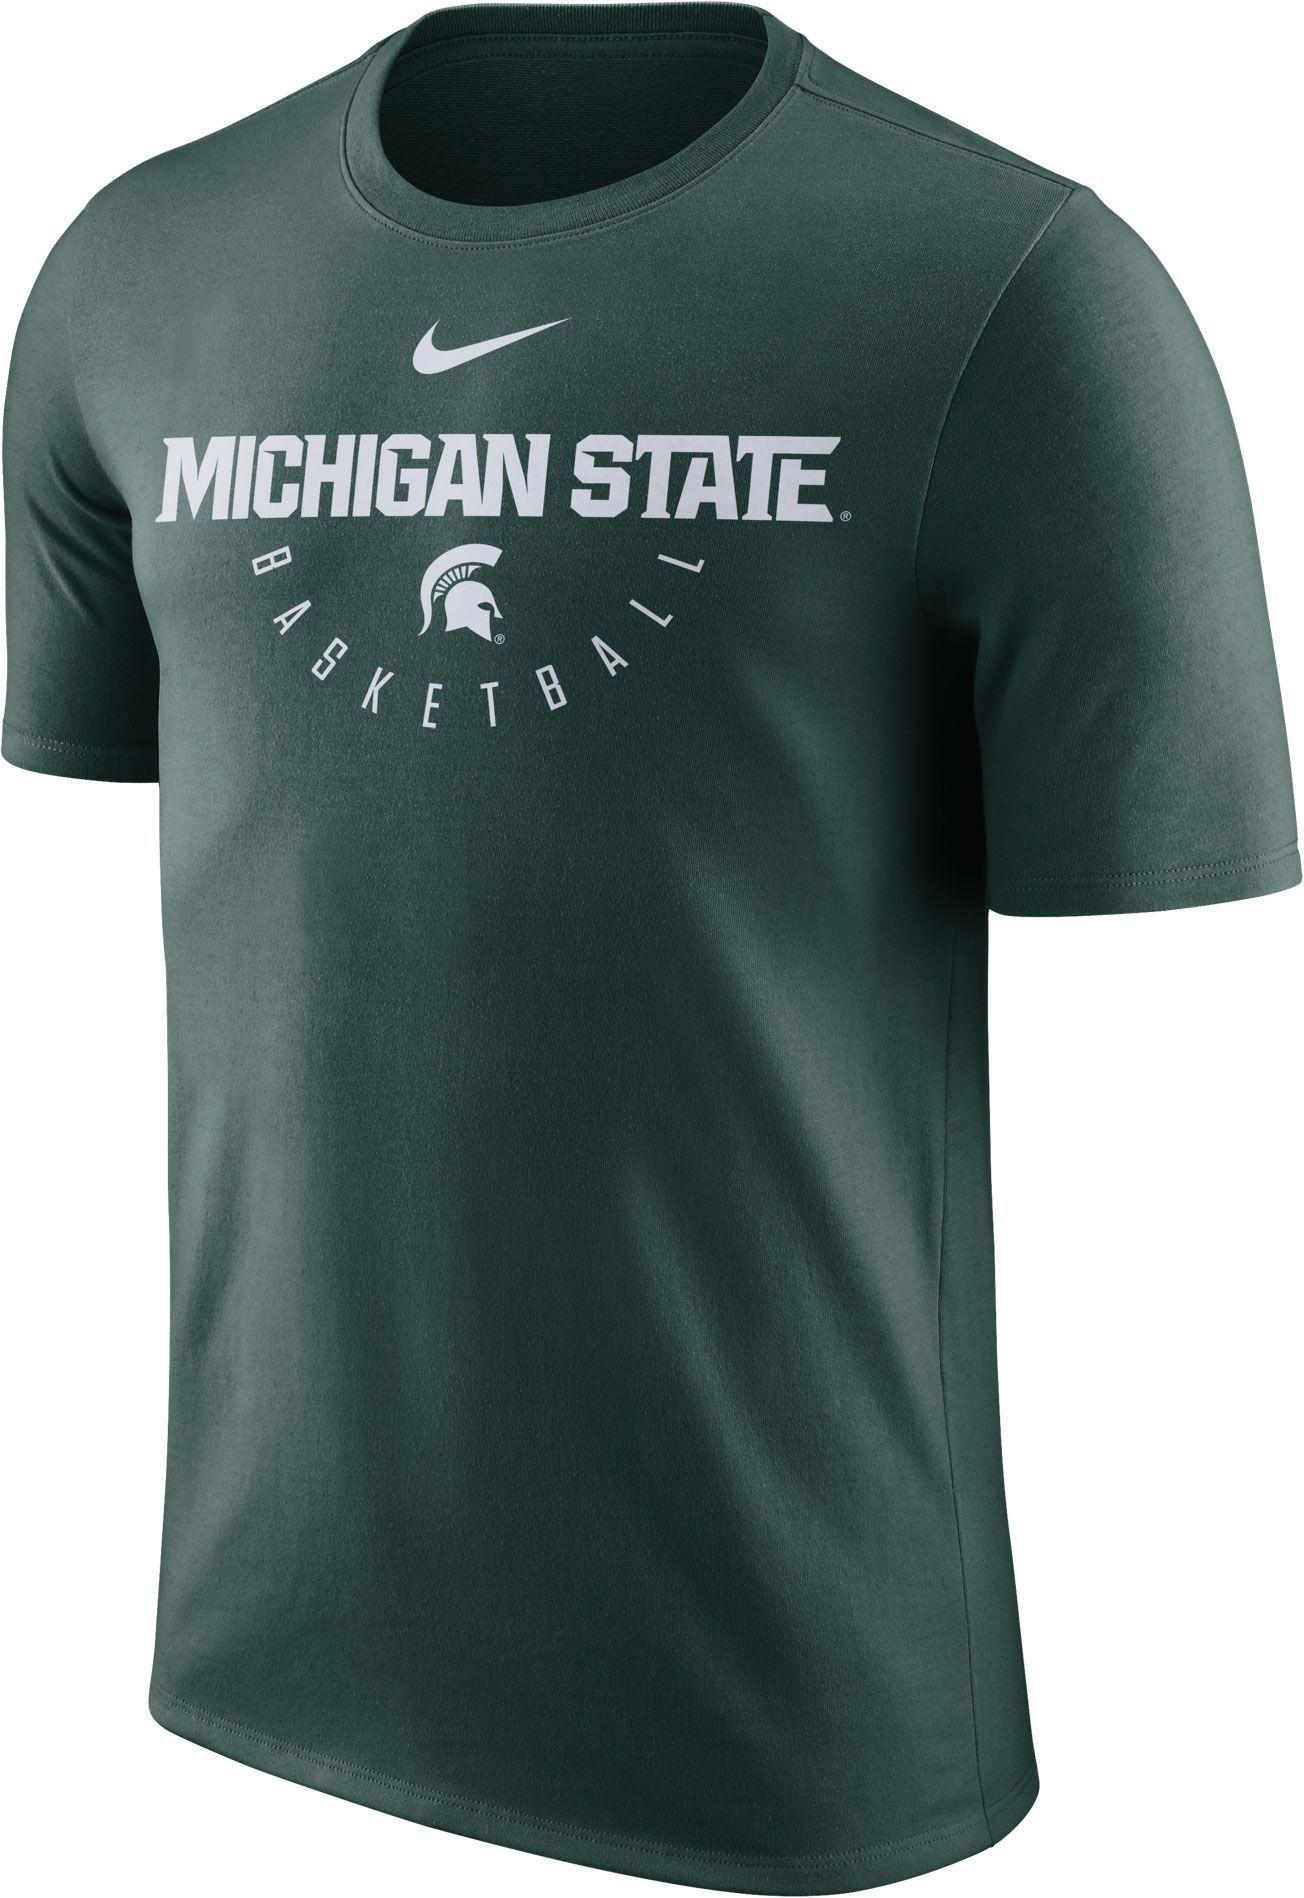 new products d483a 6debb Nike Men s Michigan State Spartans Green Key Basketball Legend T-Shirt,  Size  Medium